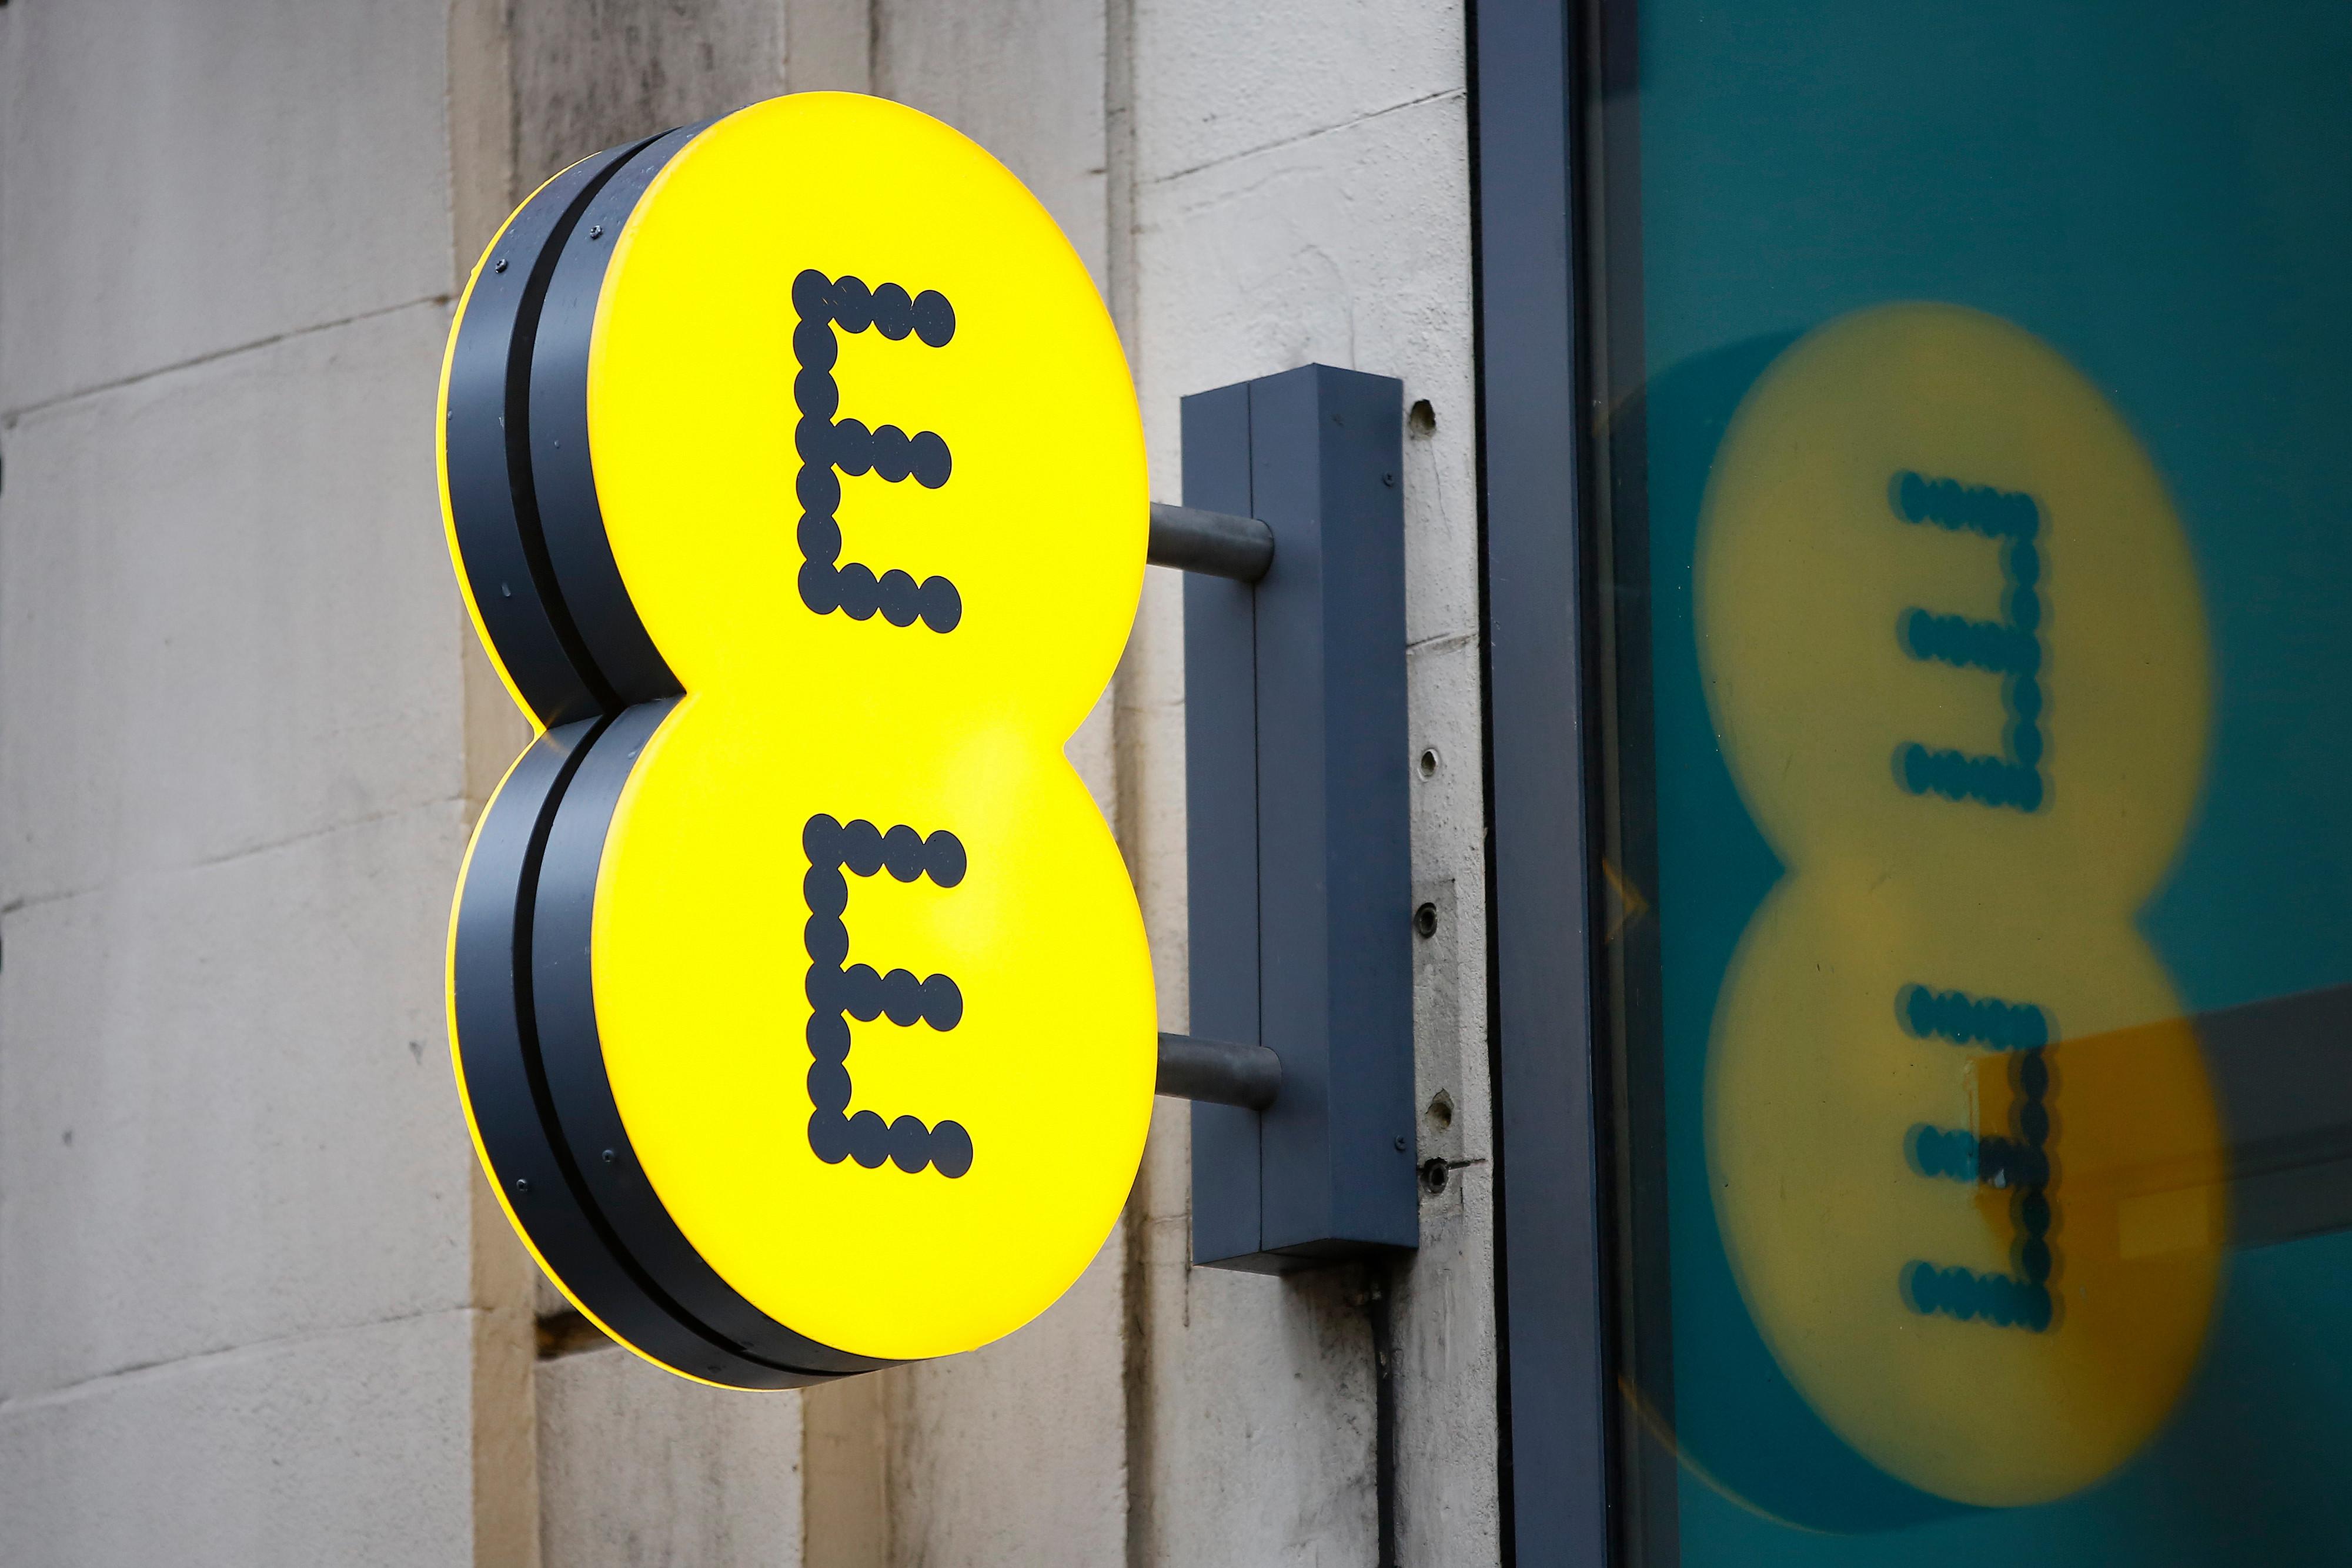 EEand Three's Sim-only deals start at £13 a month, whereas Vodafone's Sim-only deals start at £11 a month